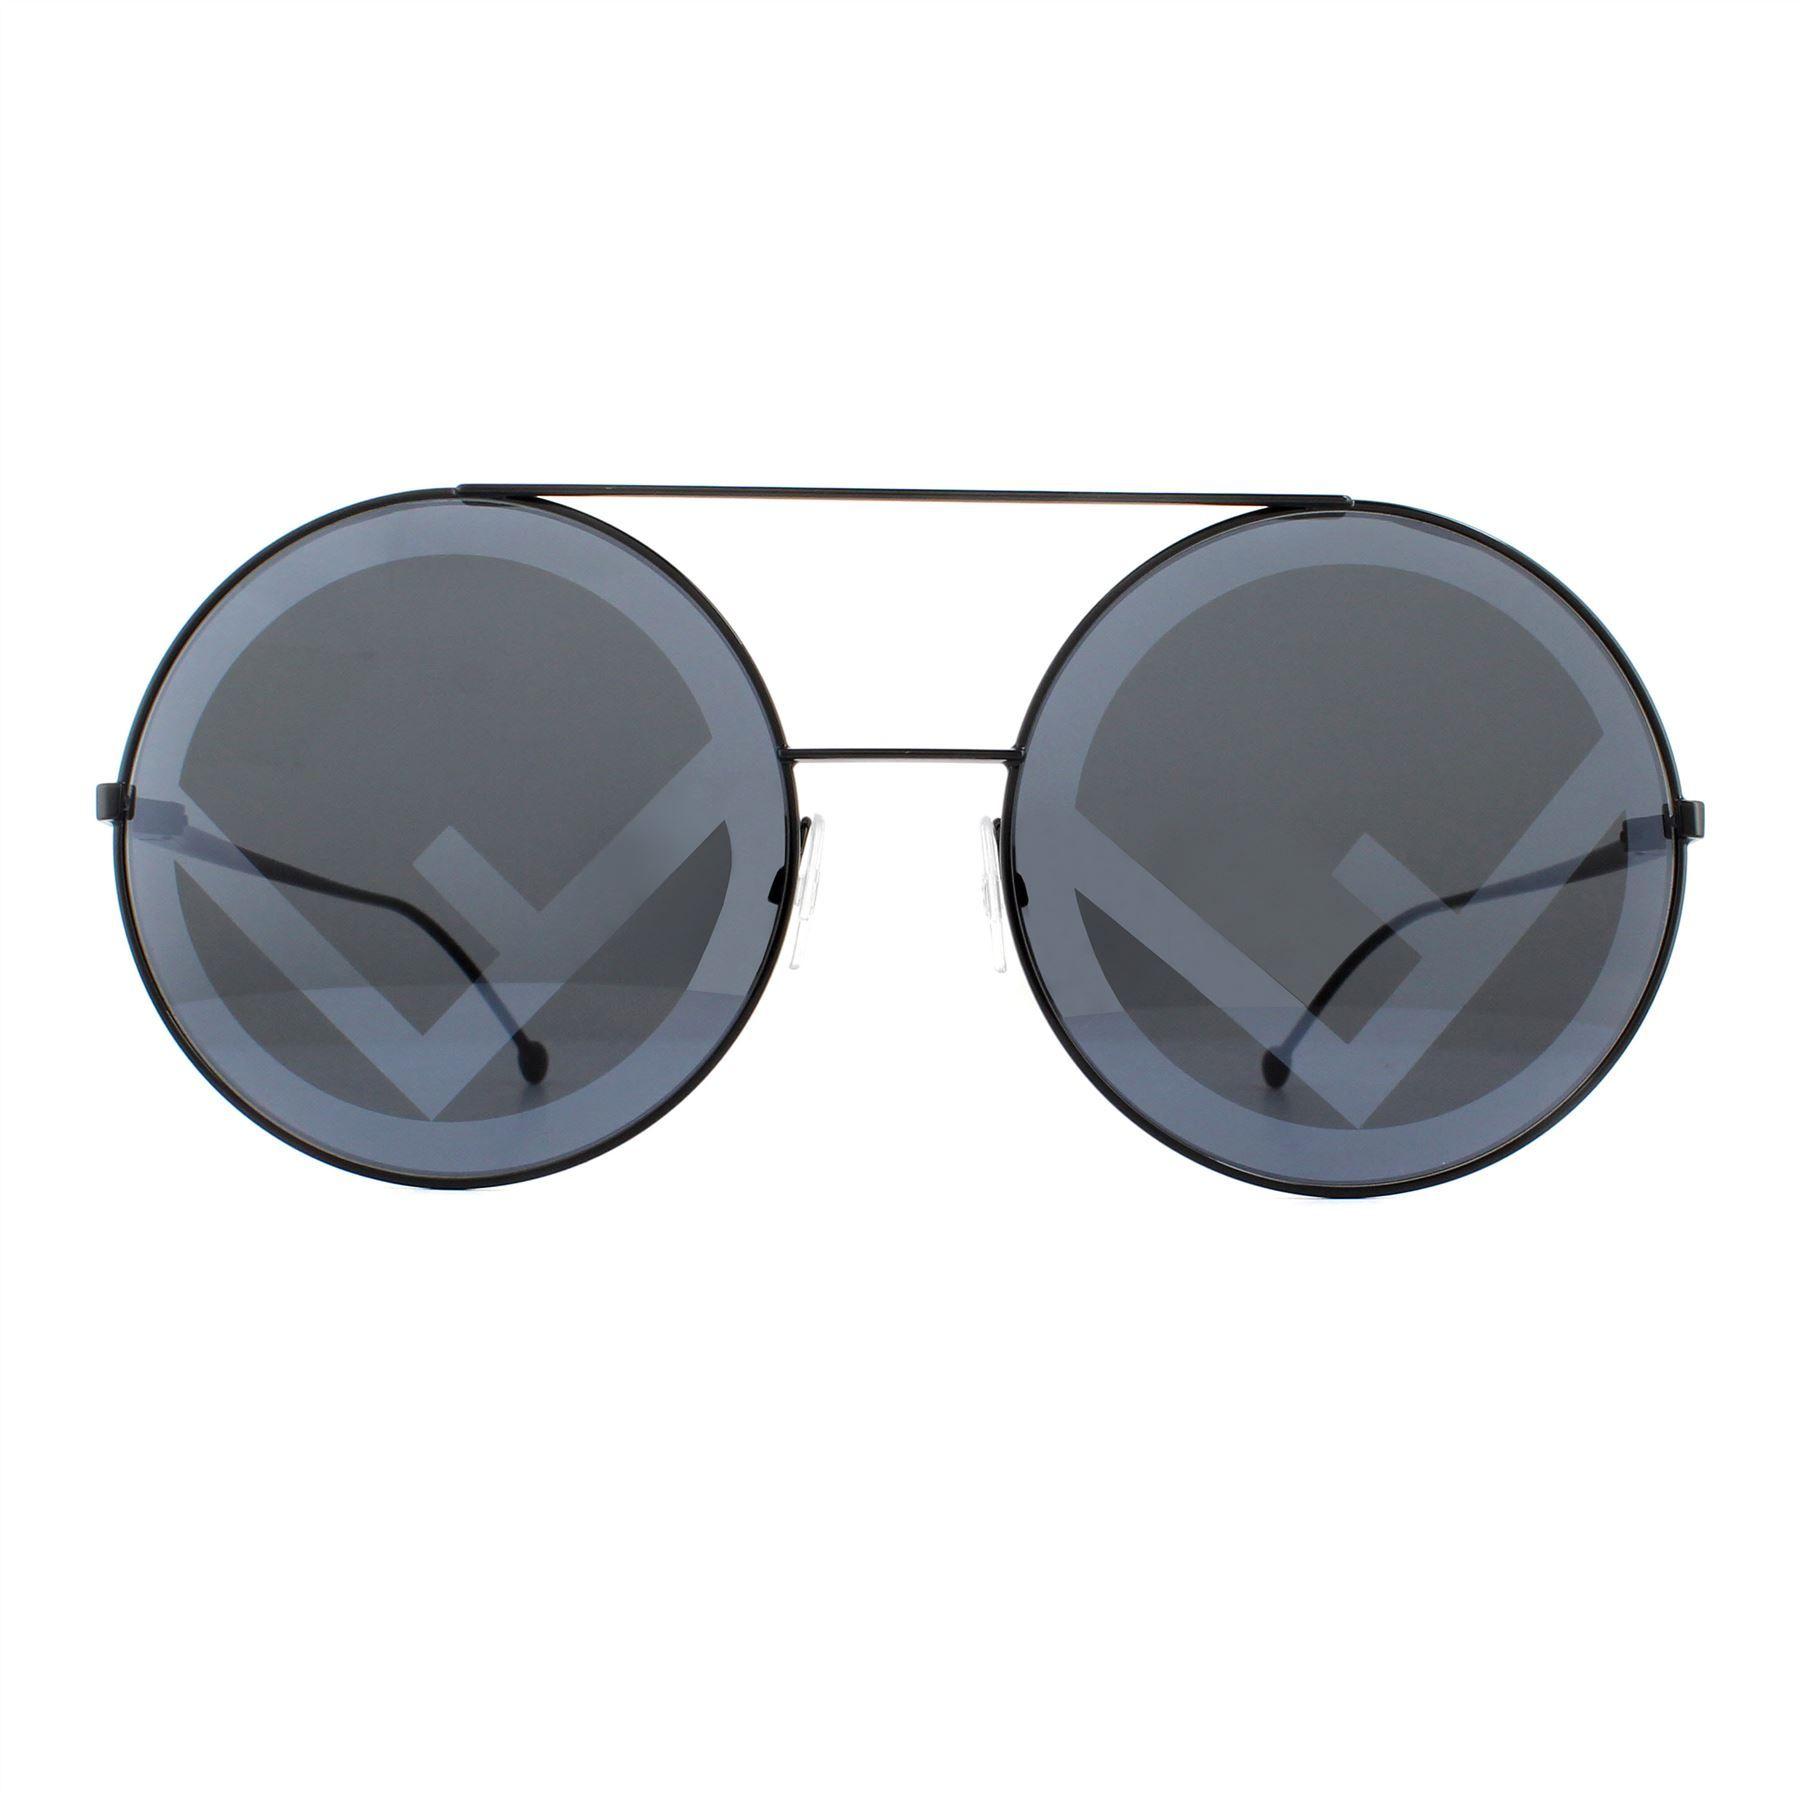 Fendi Sunglasses 0285/S 807 MD Black Grey with Fendi Statement